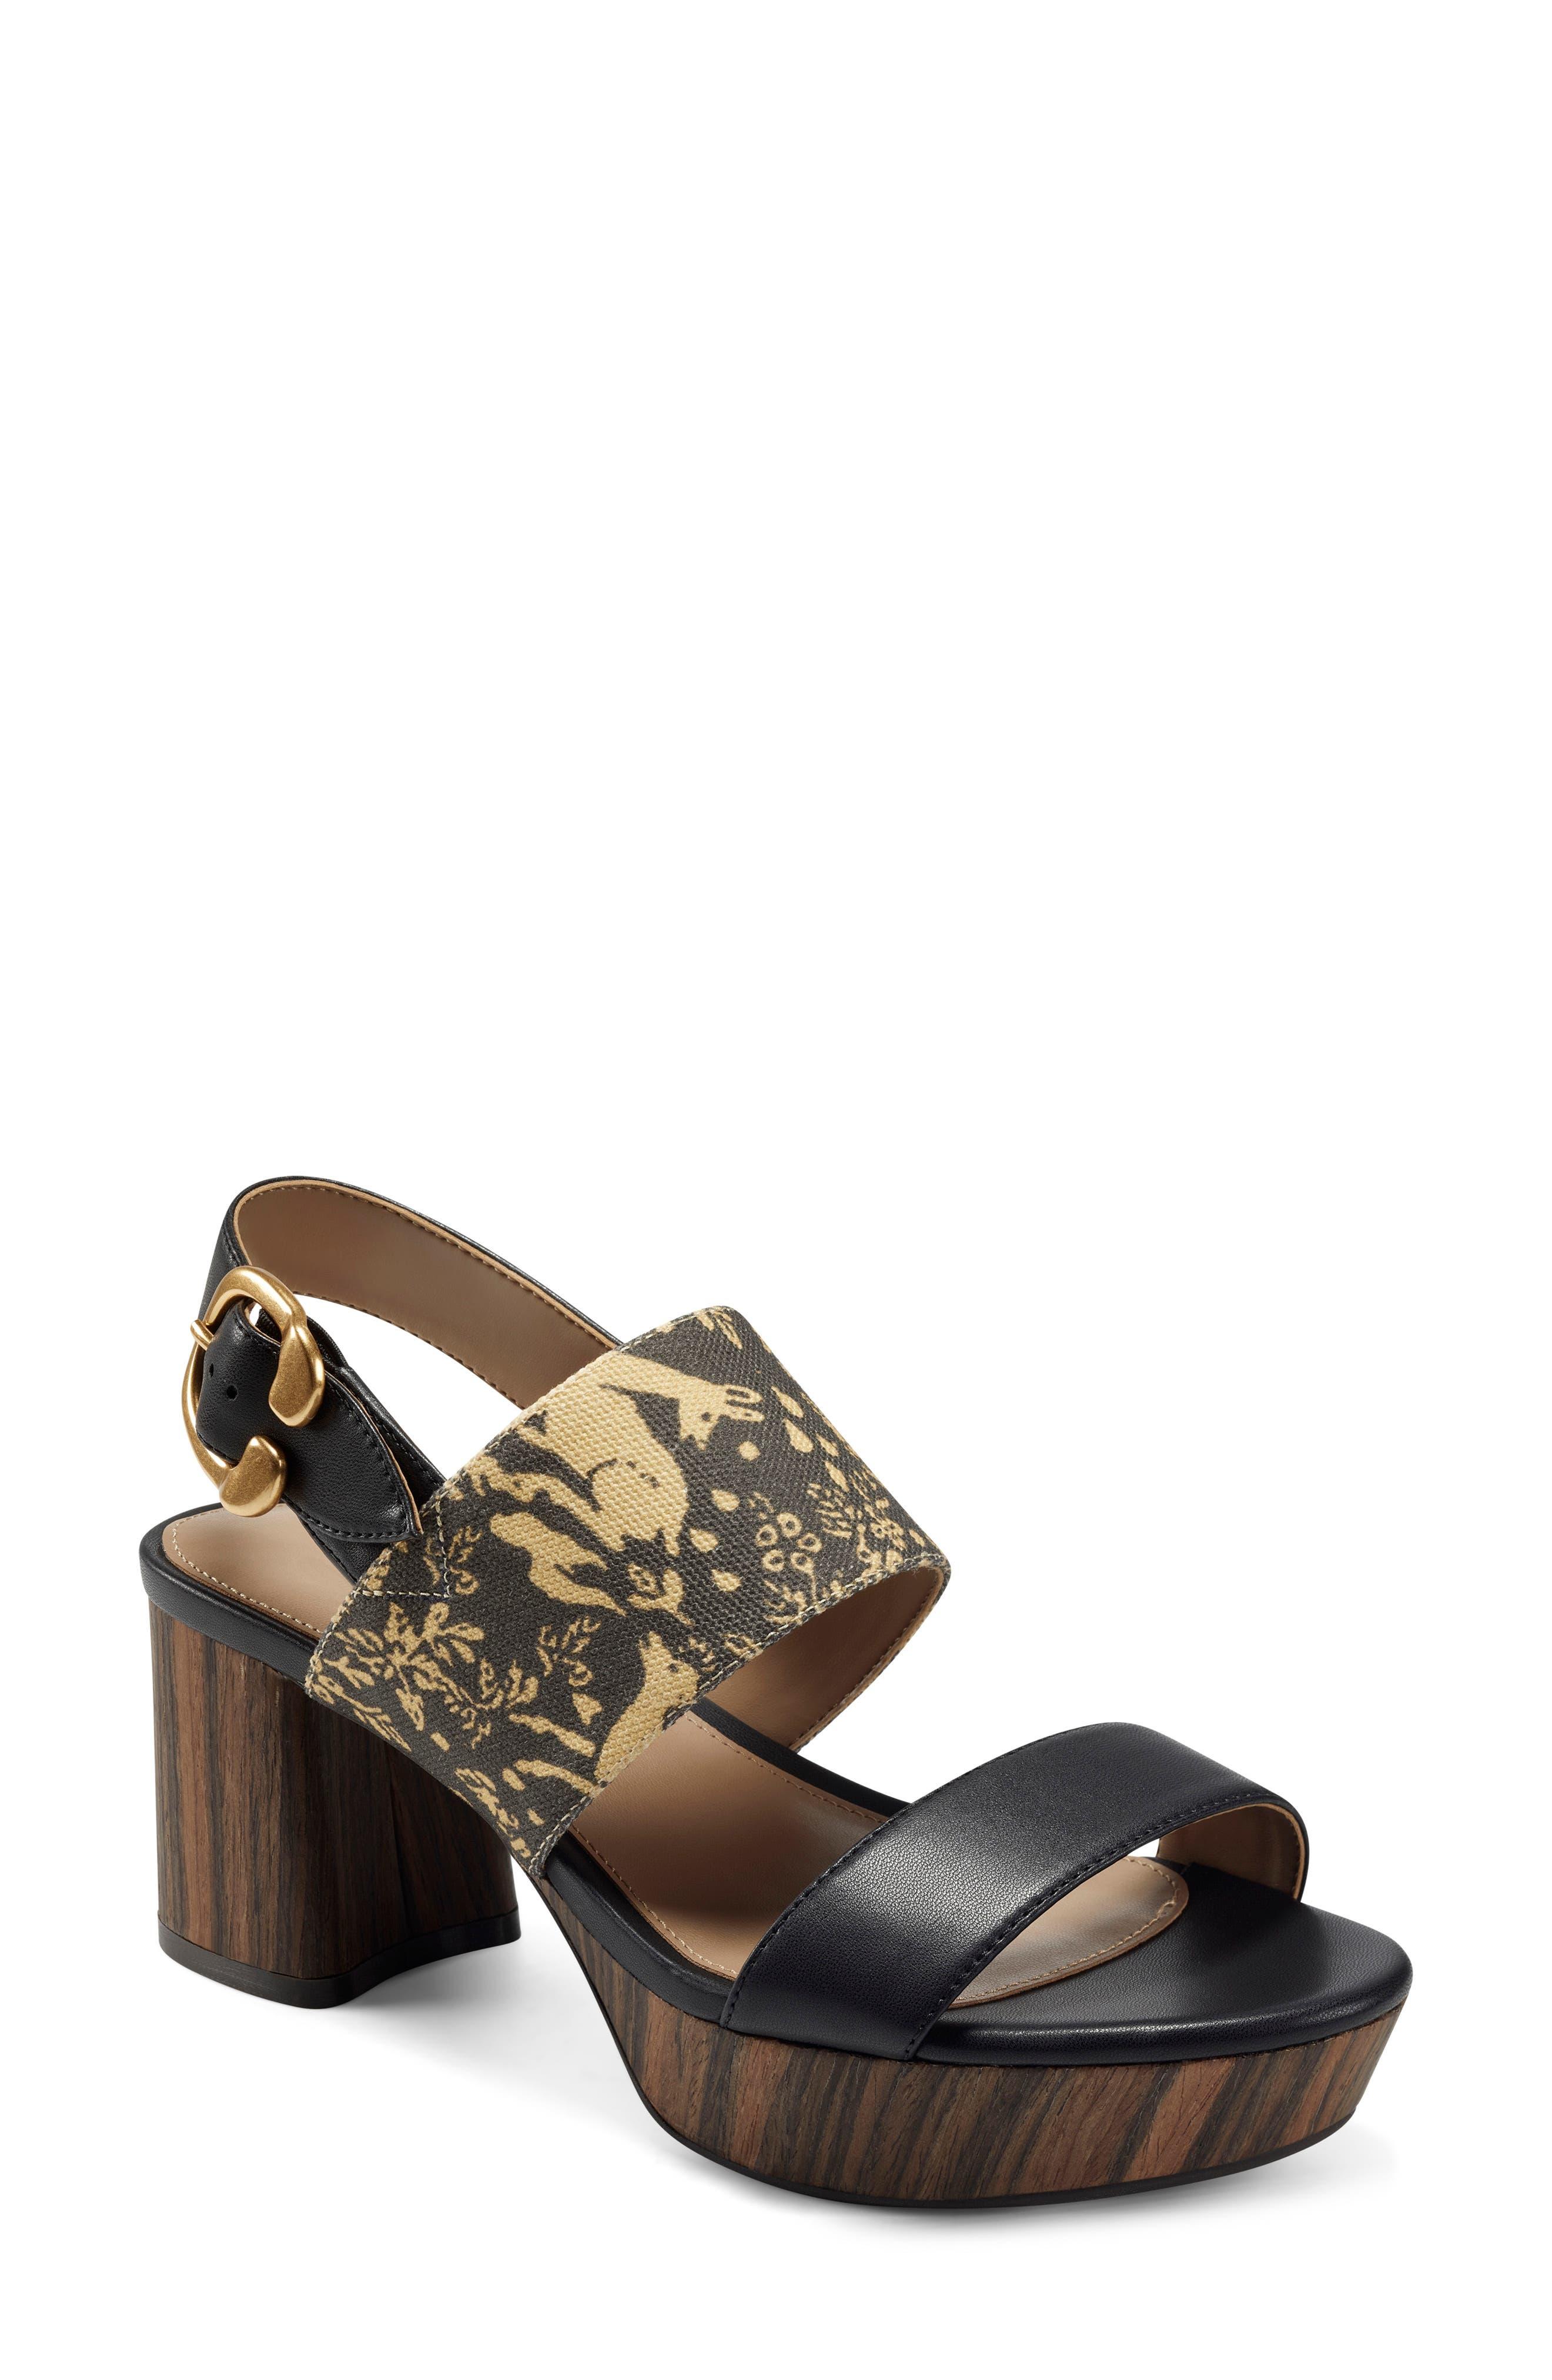 X Laura Ashley Camera Block Heel Platform Sandal